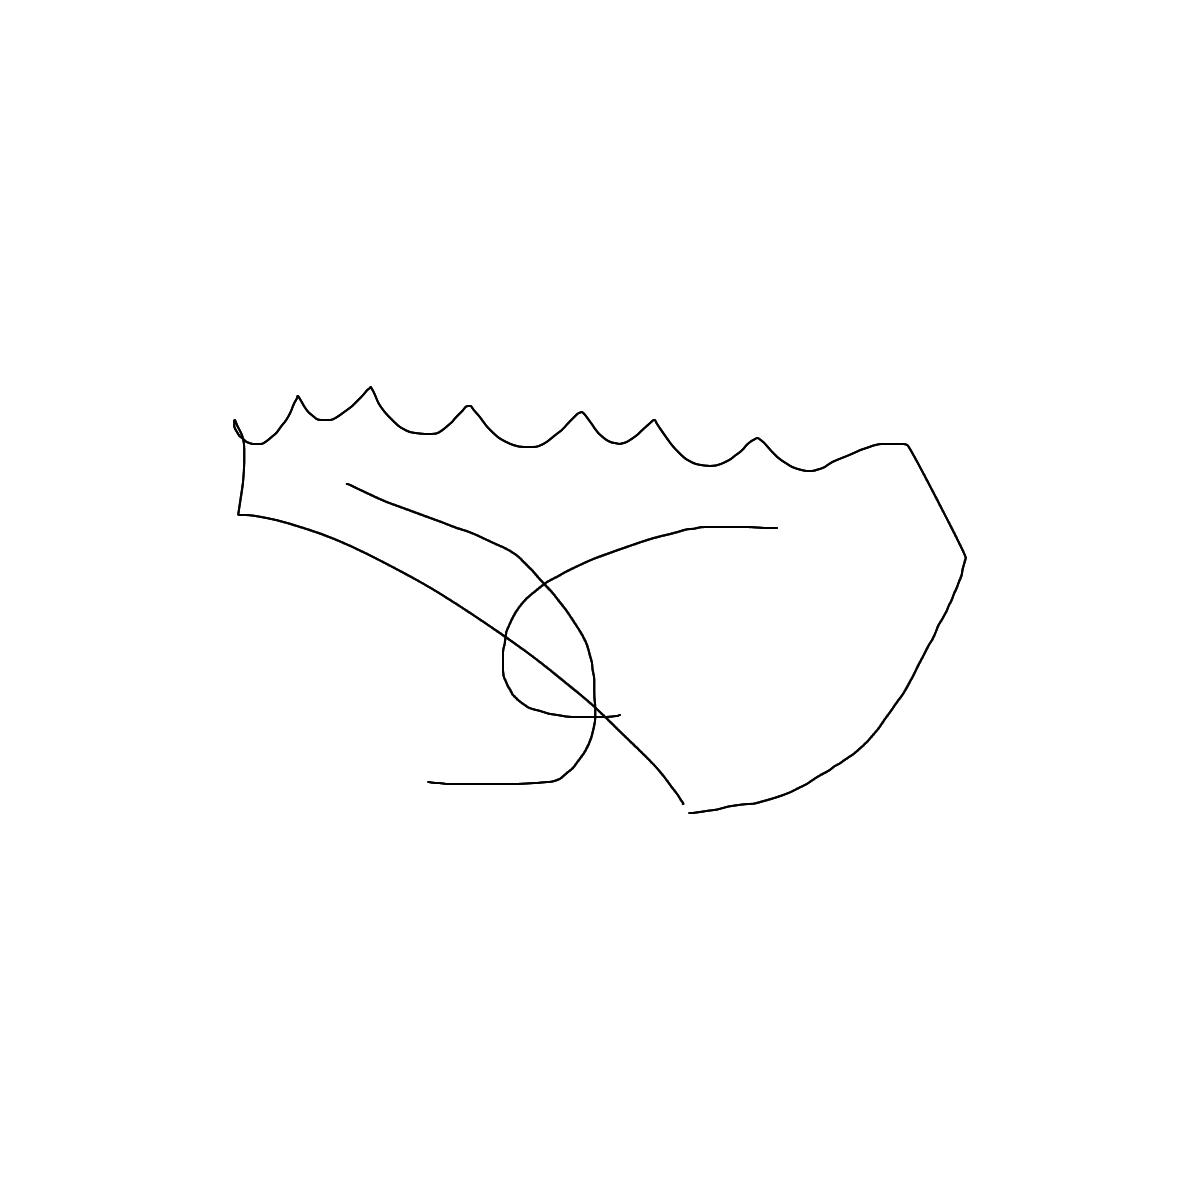 BAAAM drawing#1685 lat:45.5490226745605500lng: -73.7168121337890600